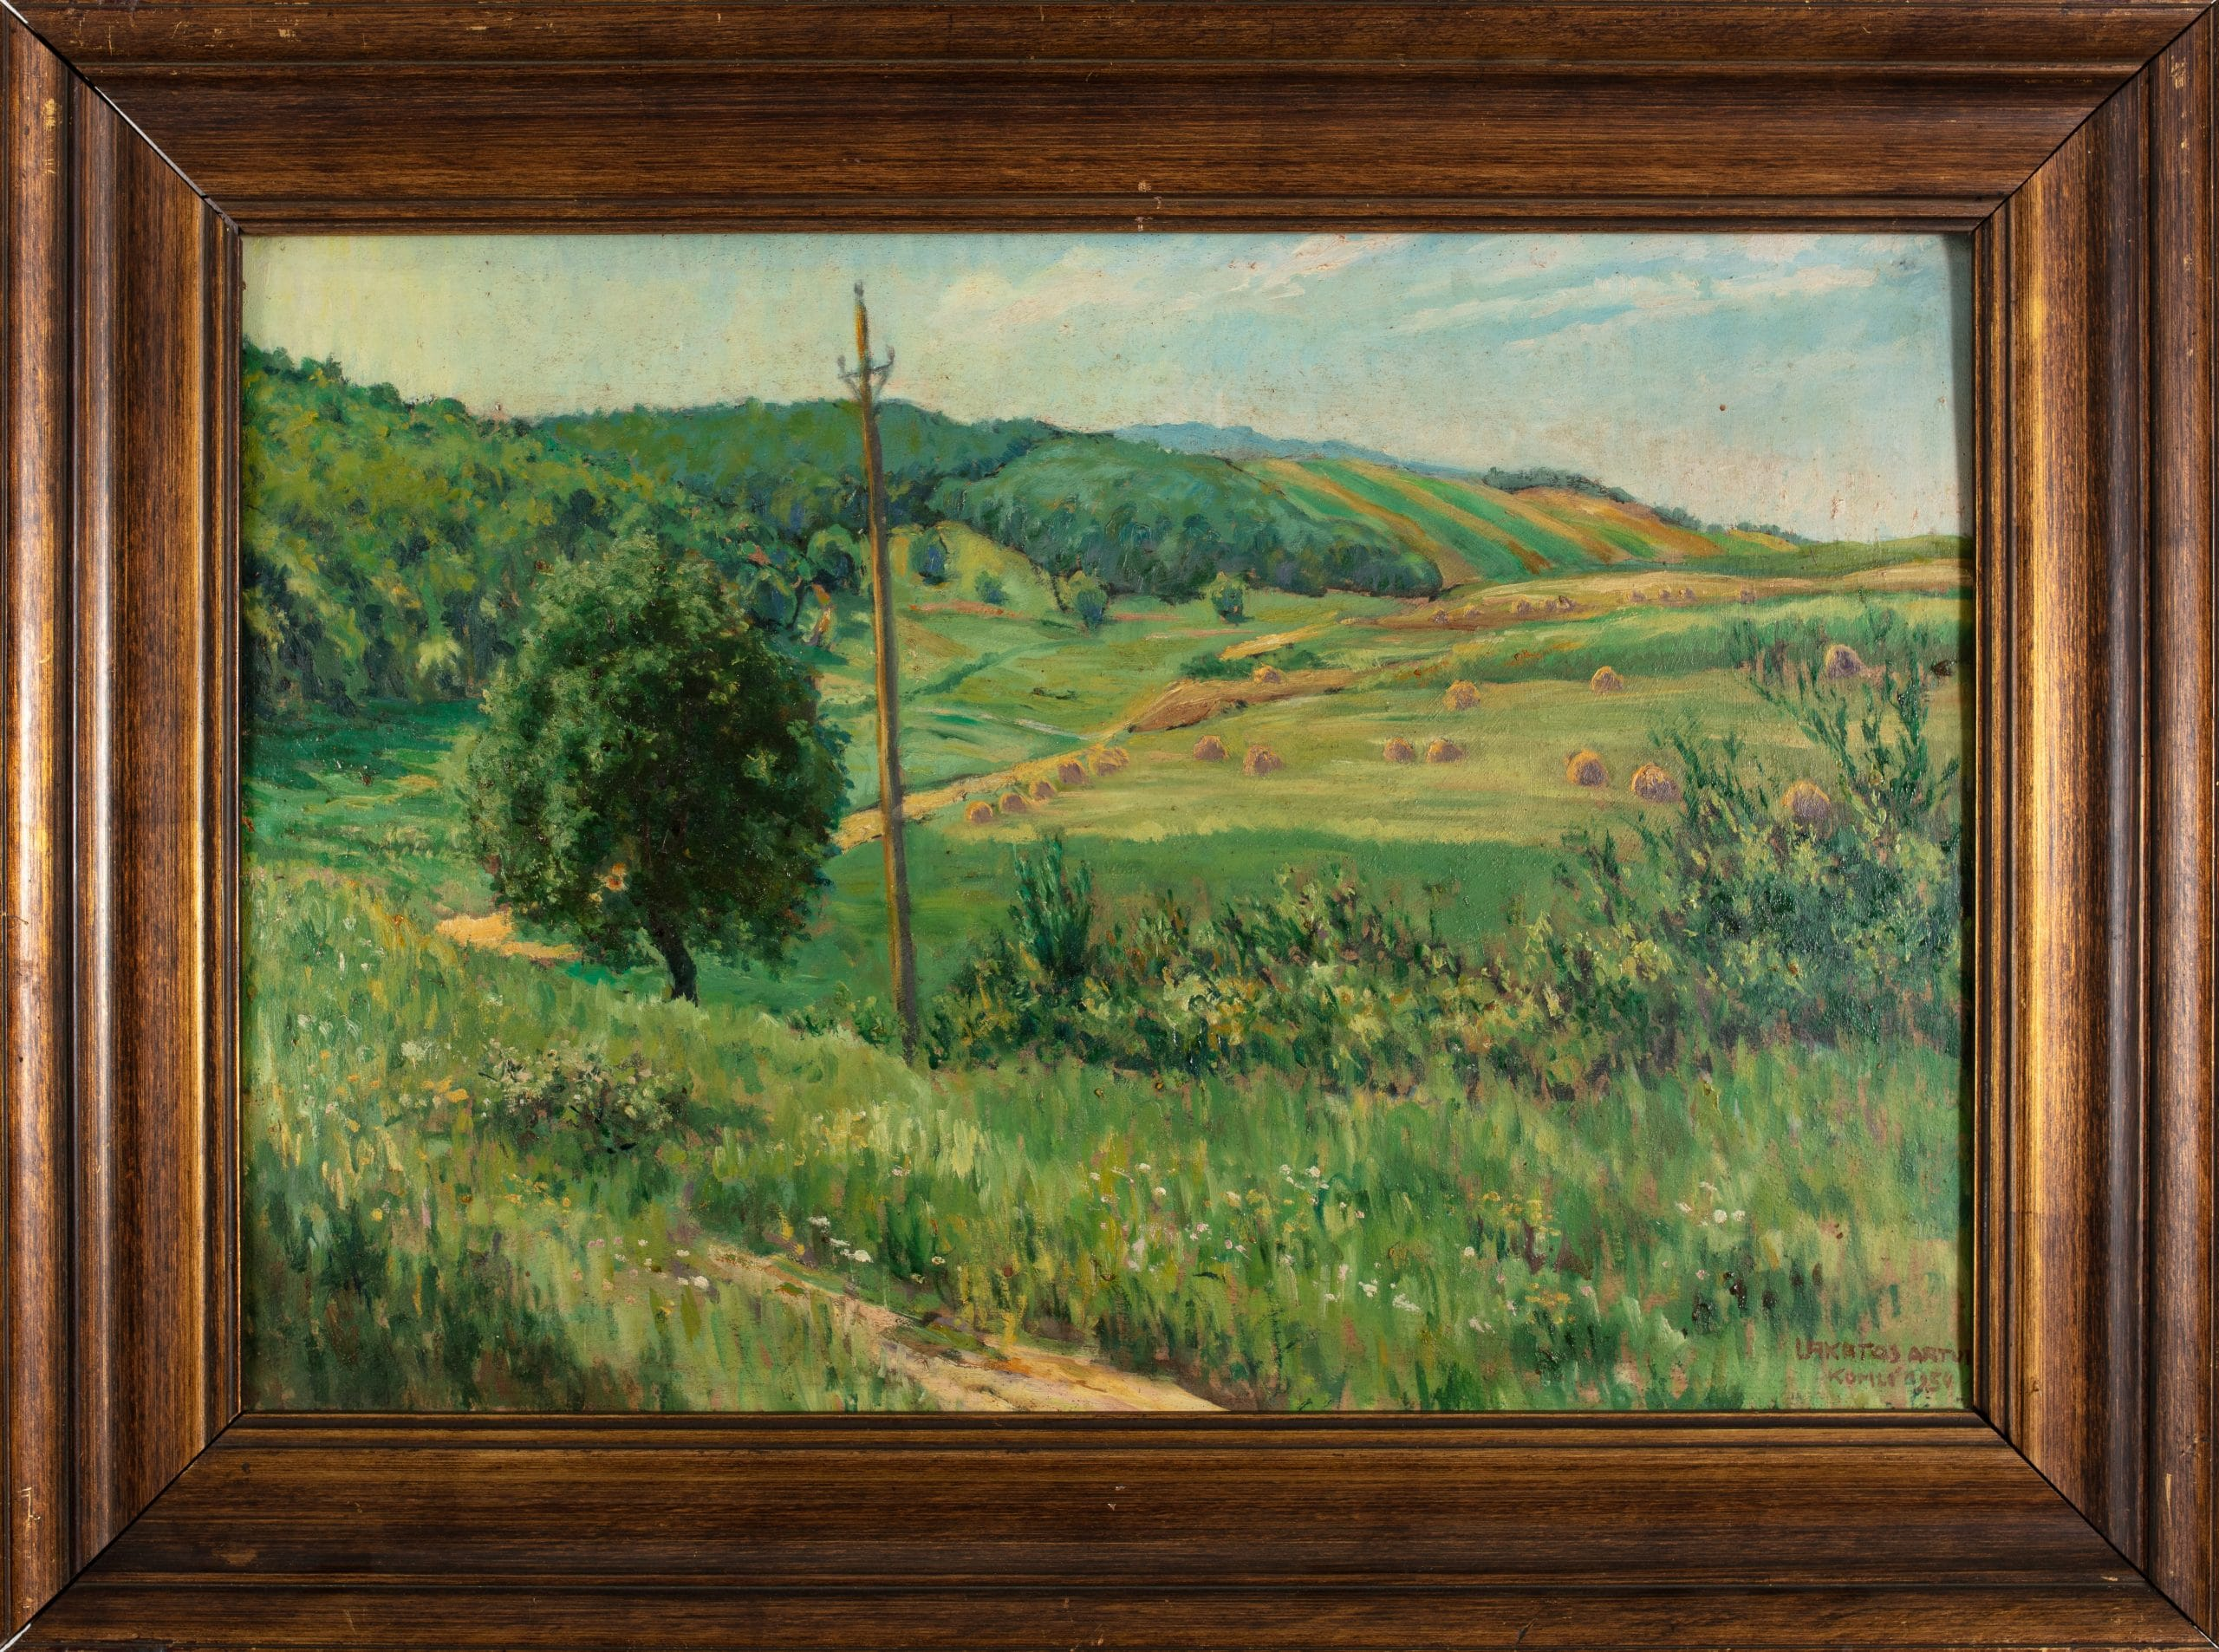 Lakatos Artúr: Komlói földek, 1934